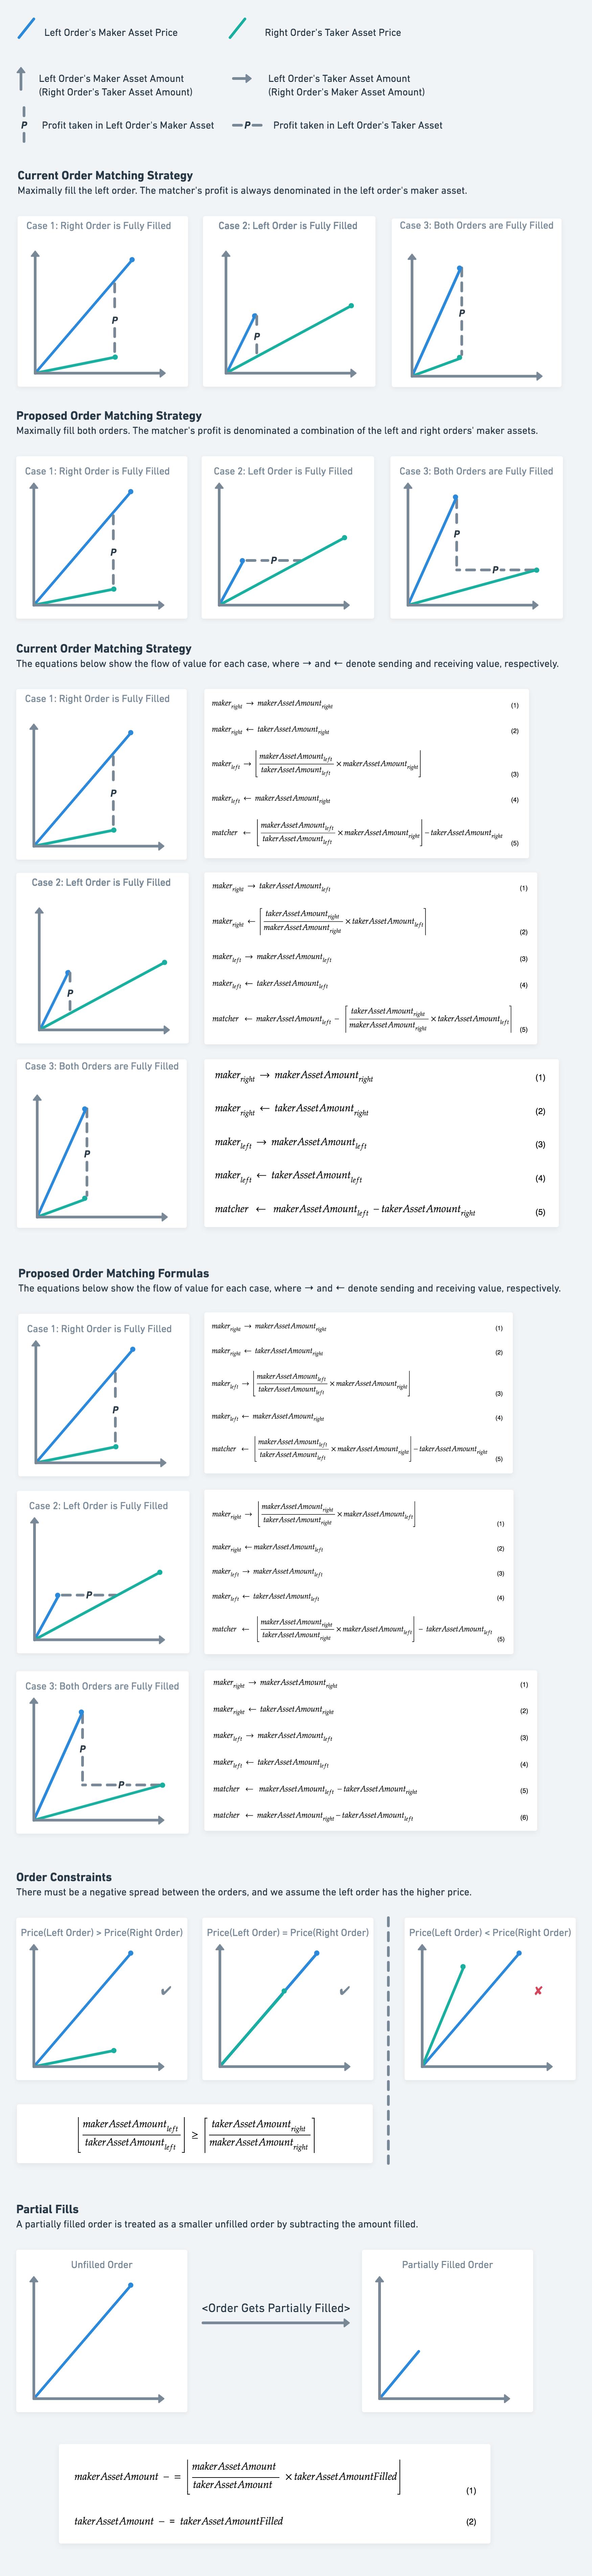 Comparison of Matching Strategies